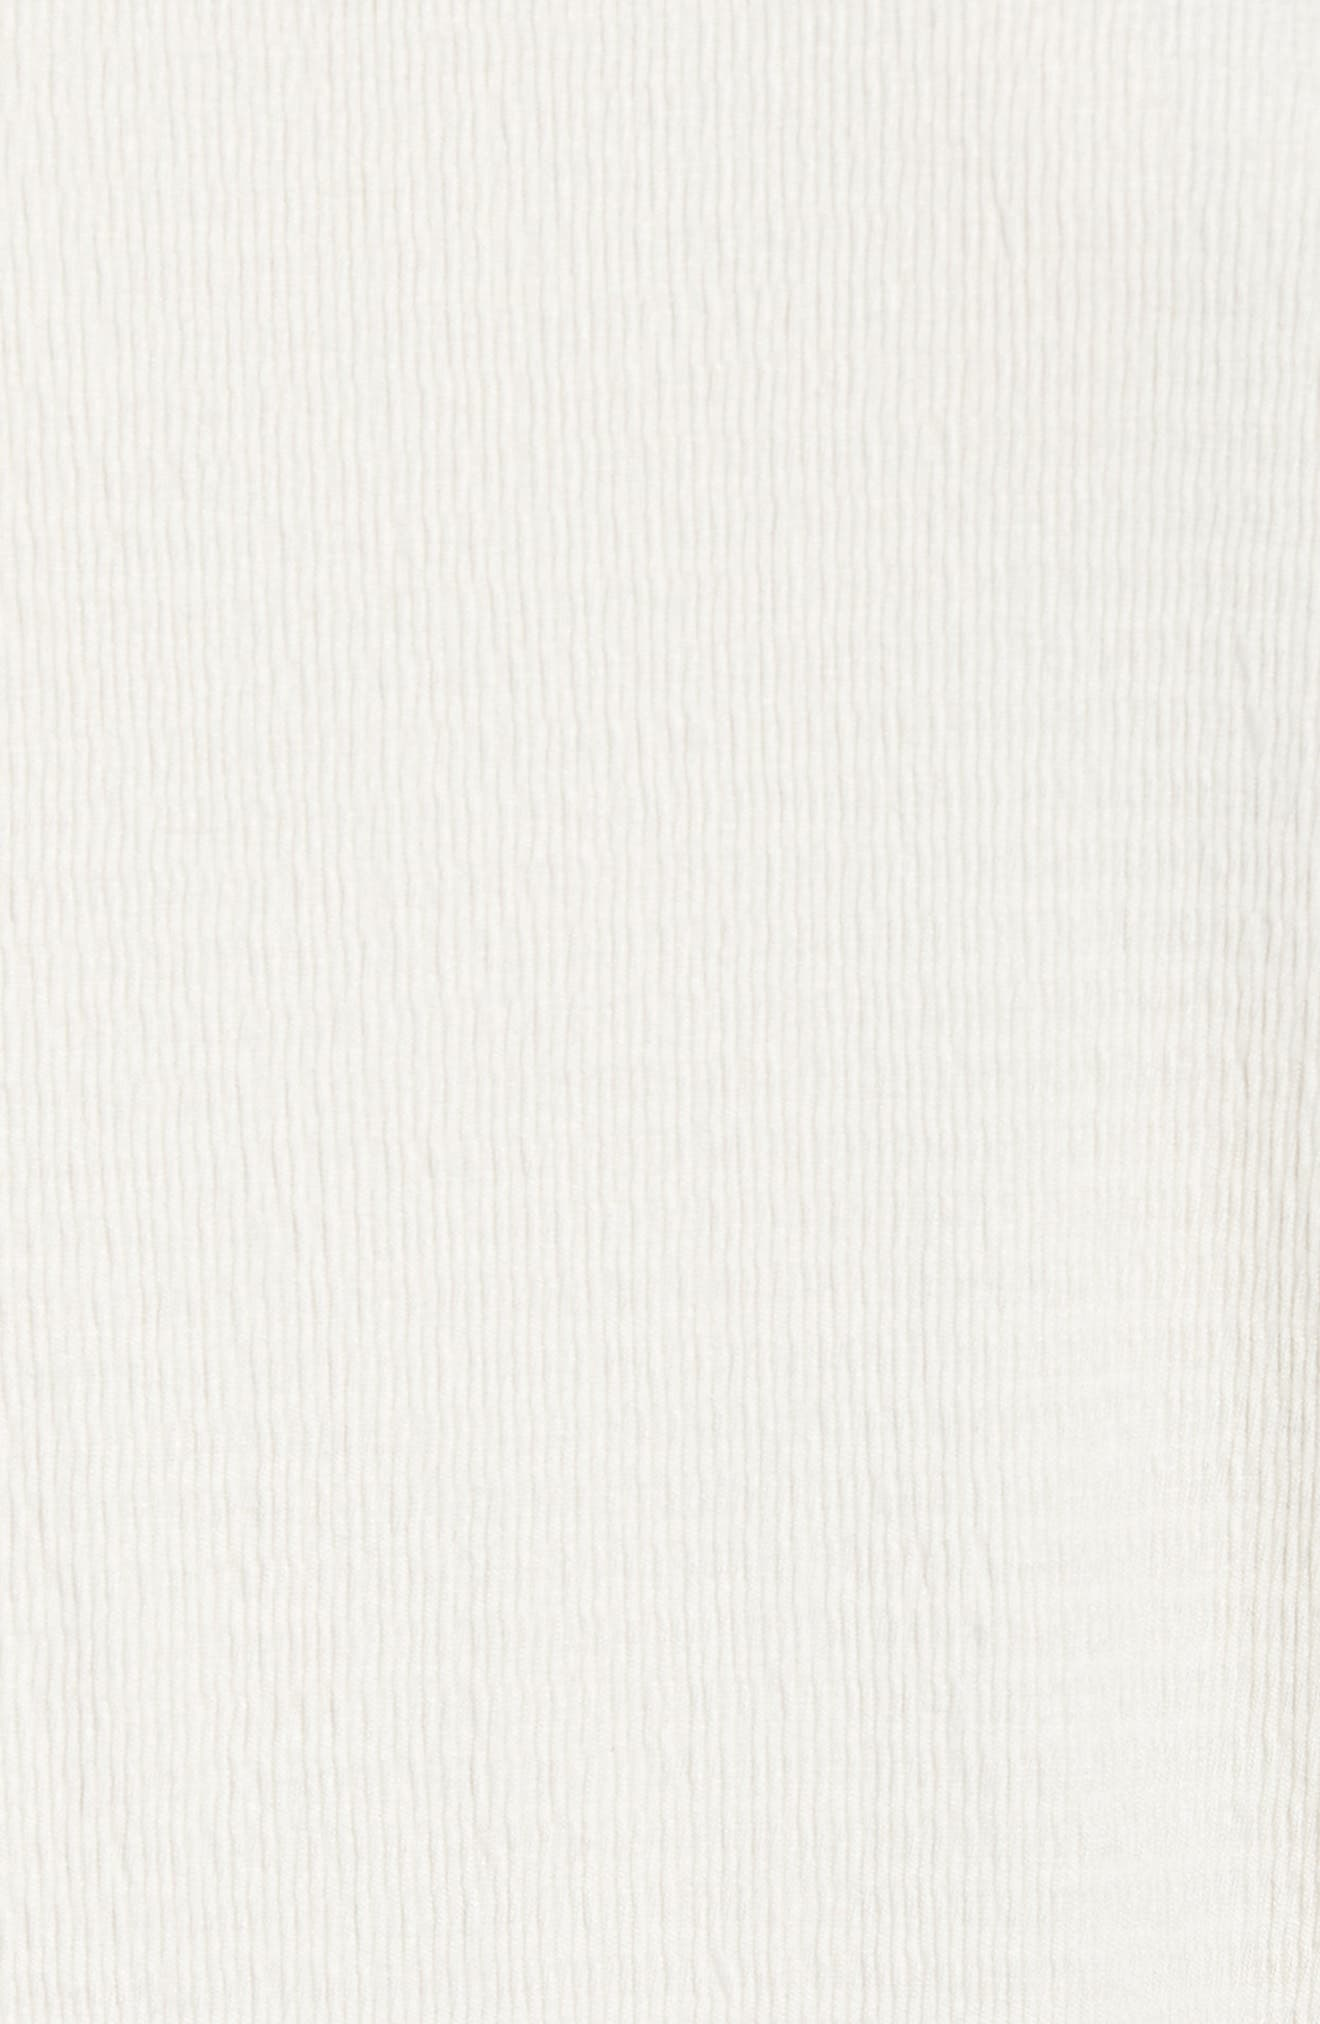 Sportswear AF-1 Long Sleeve Shirt,                             Alternate thumbnail 5, color,                             Light Bone/ Stucco/ Stucco